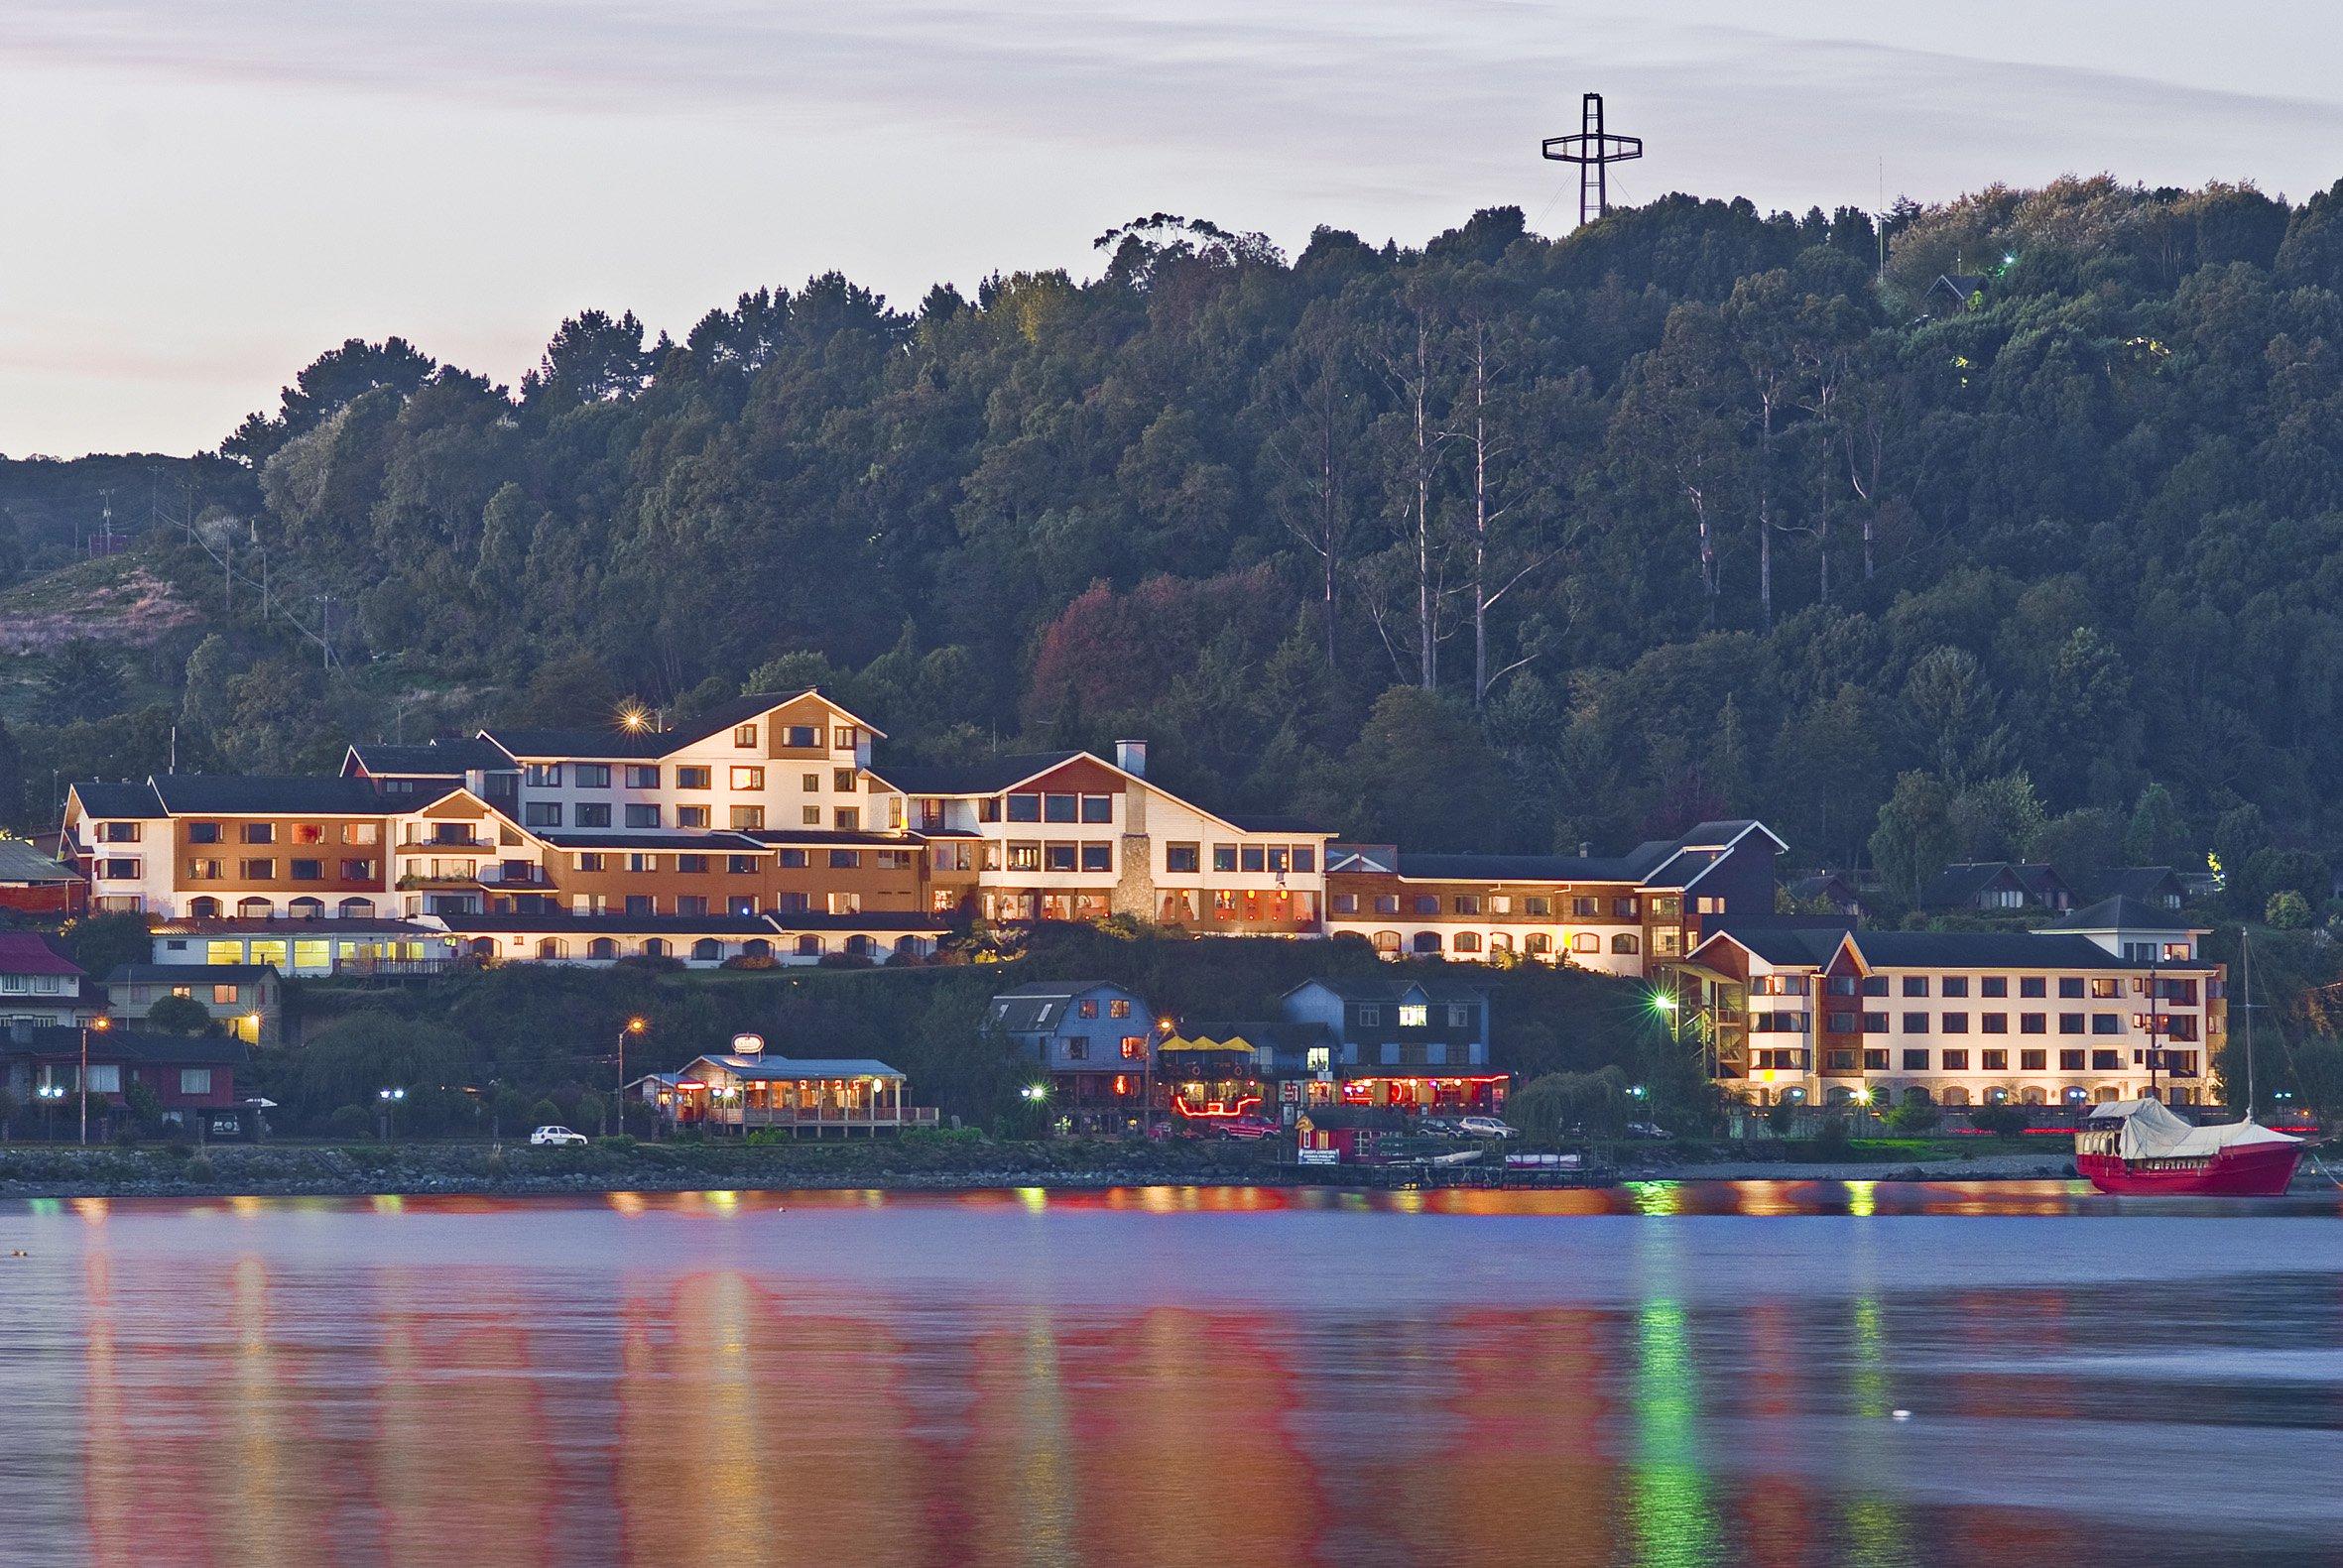 8461-hotel-cabanas-del-lago.jpg